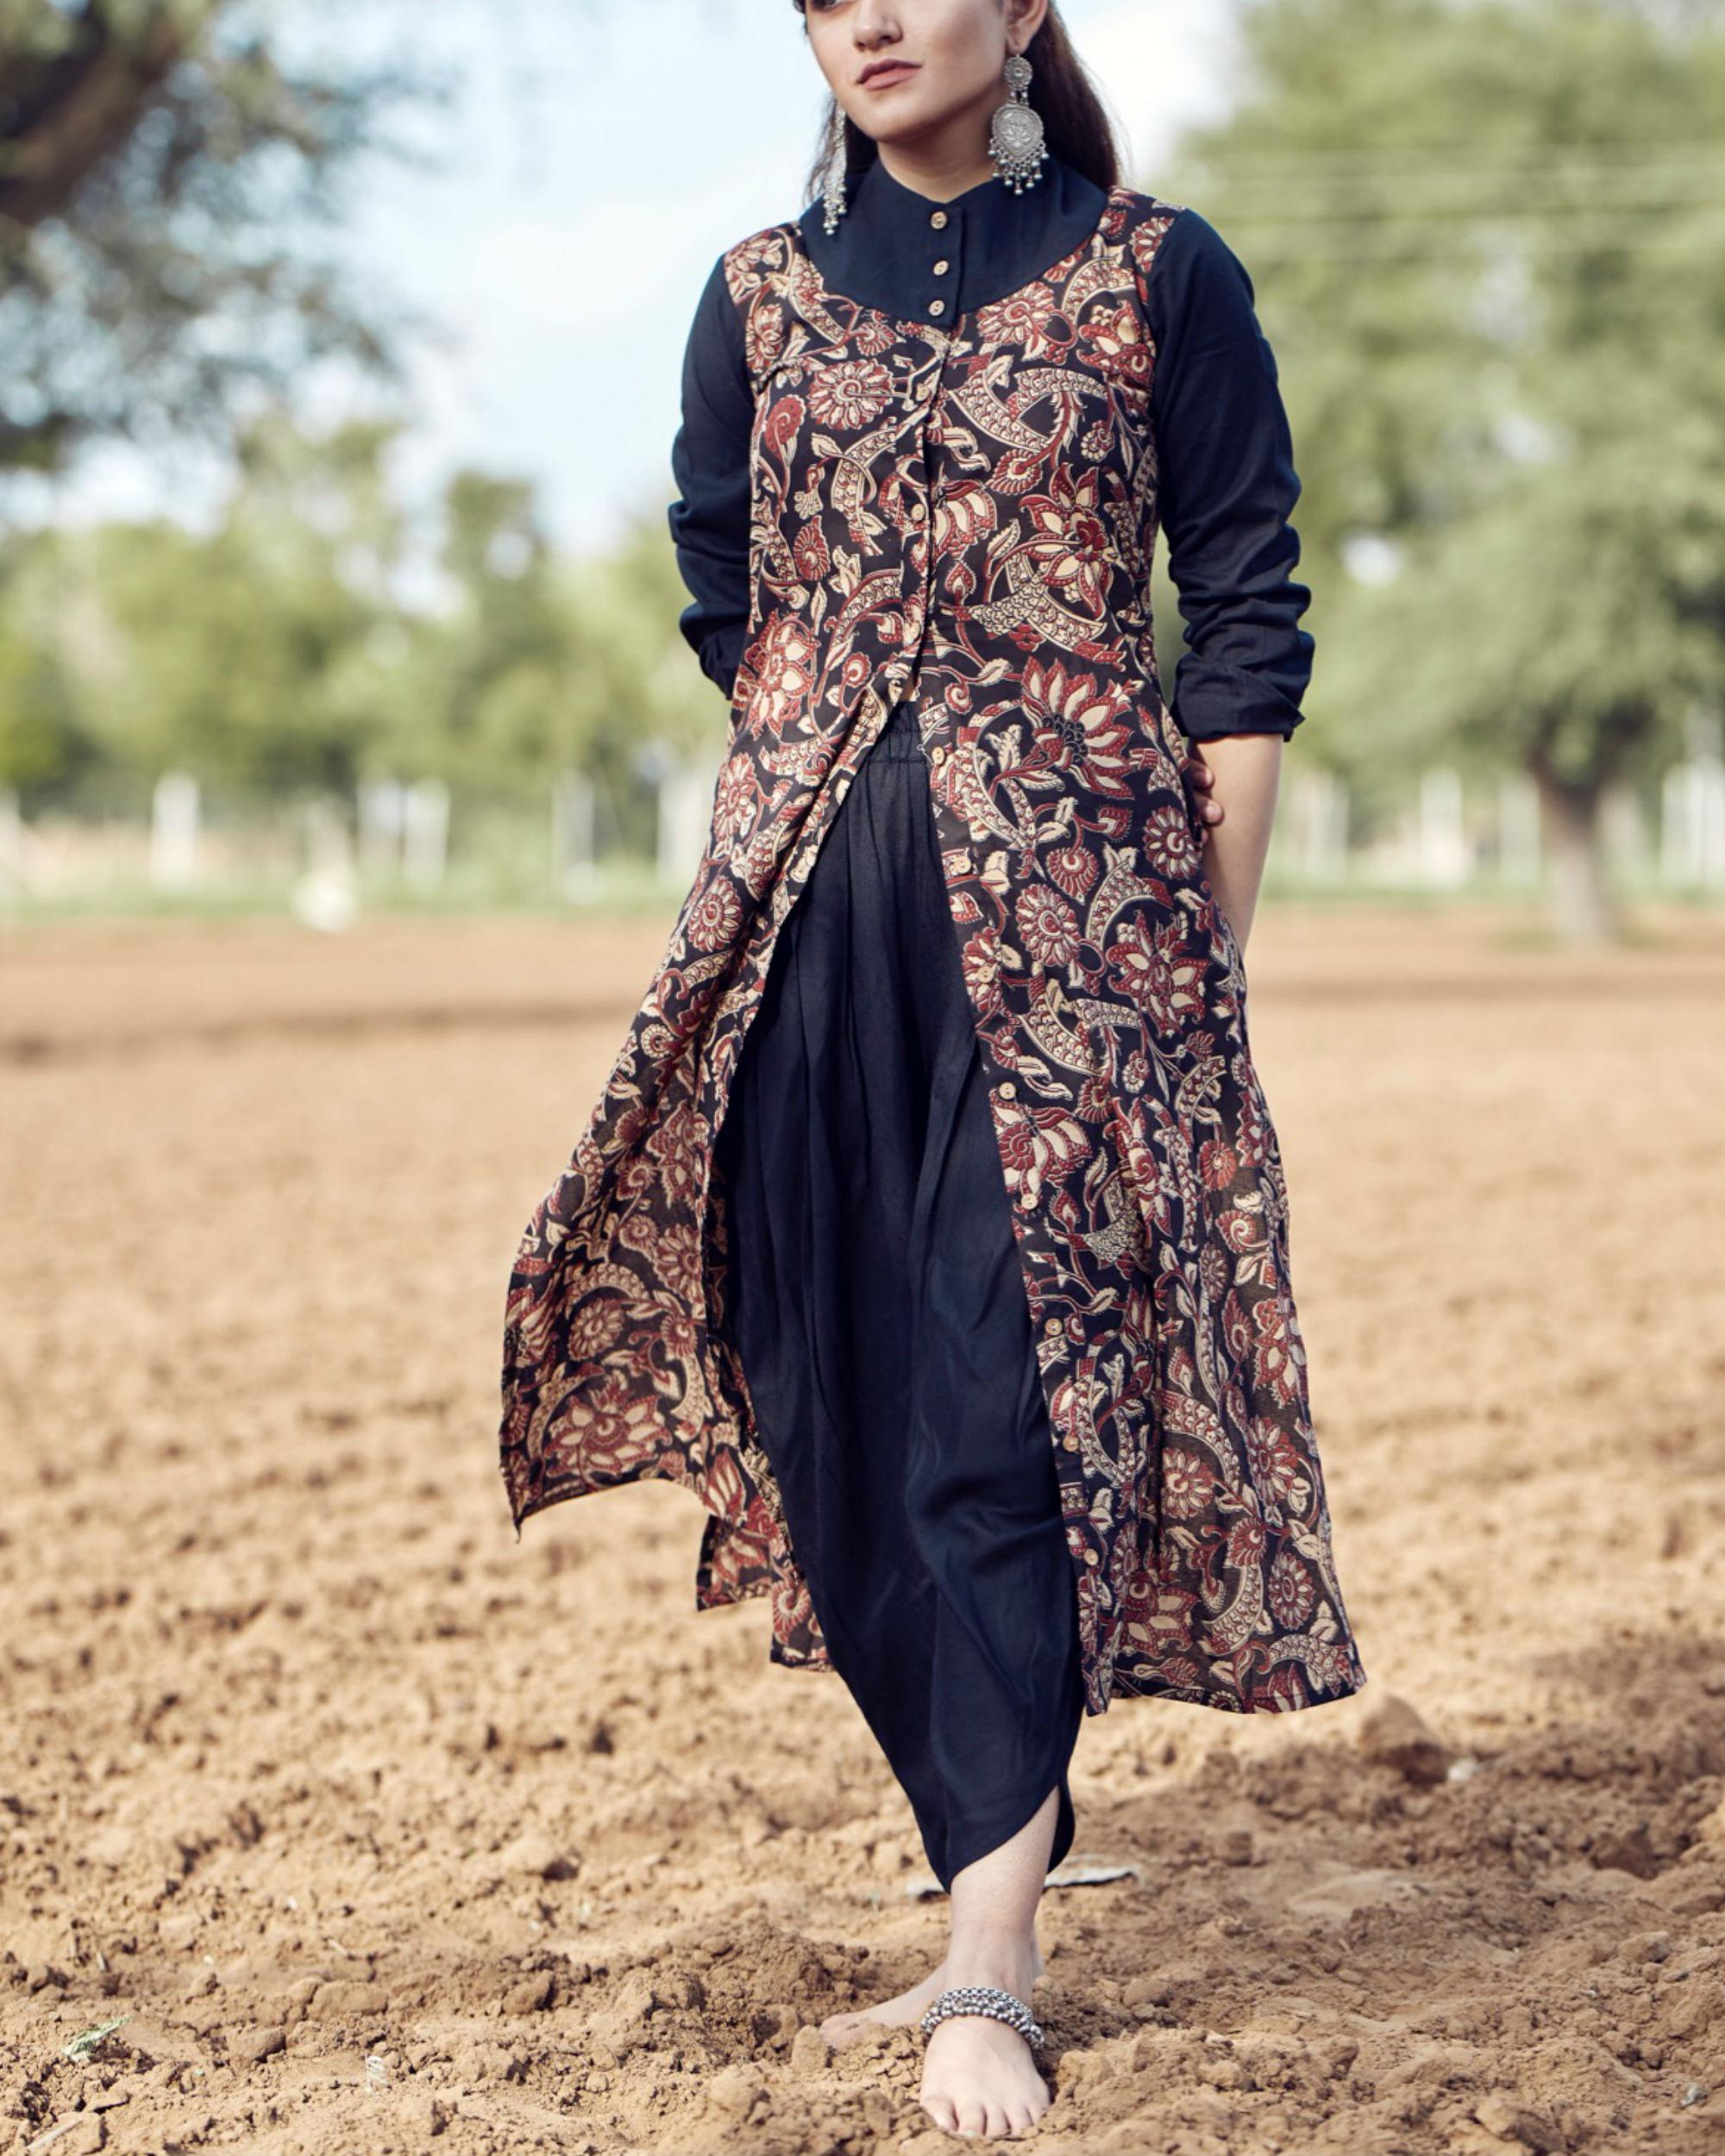 e667cf58fa4c9 Mughal print shirt and dhoti set by Label Harsha Khatry